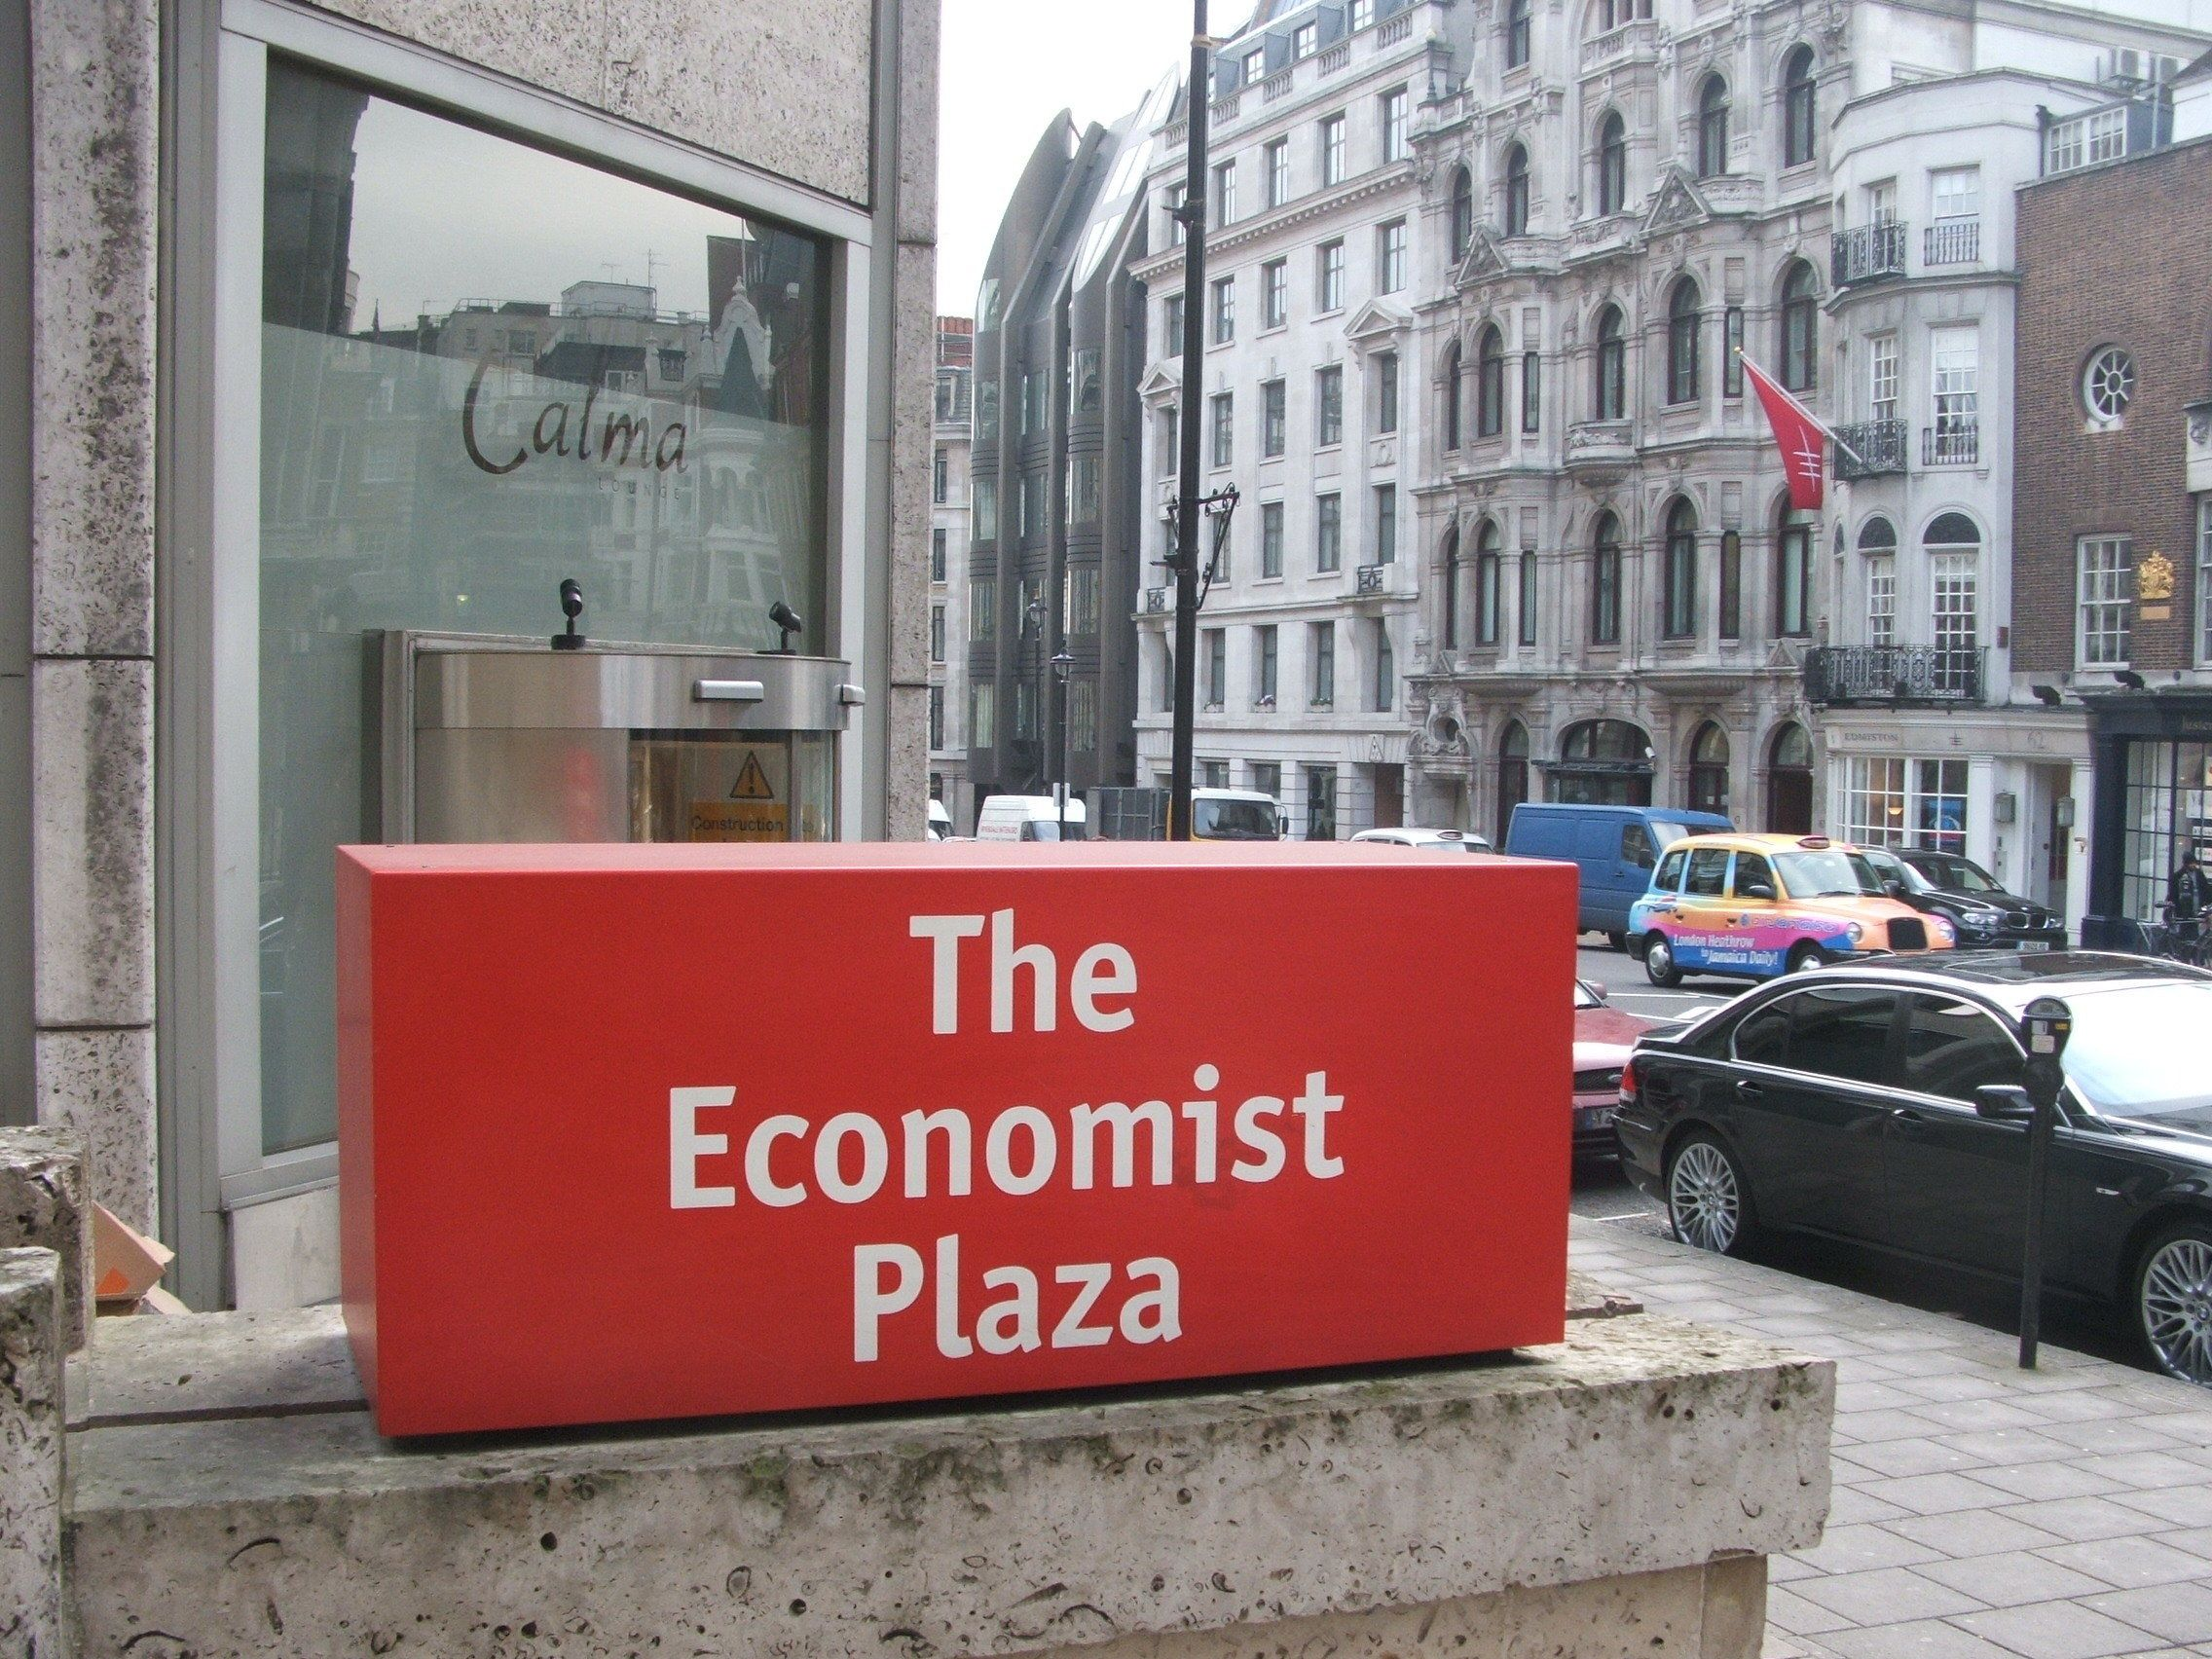 The Economist Plaza #1, London